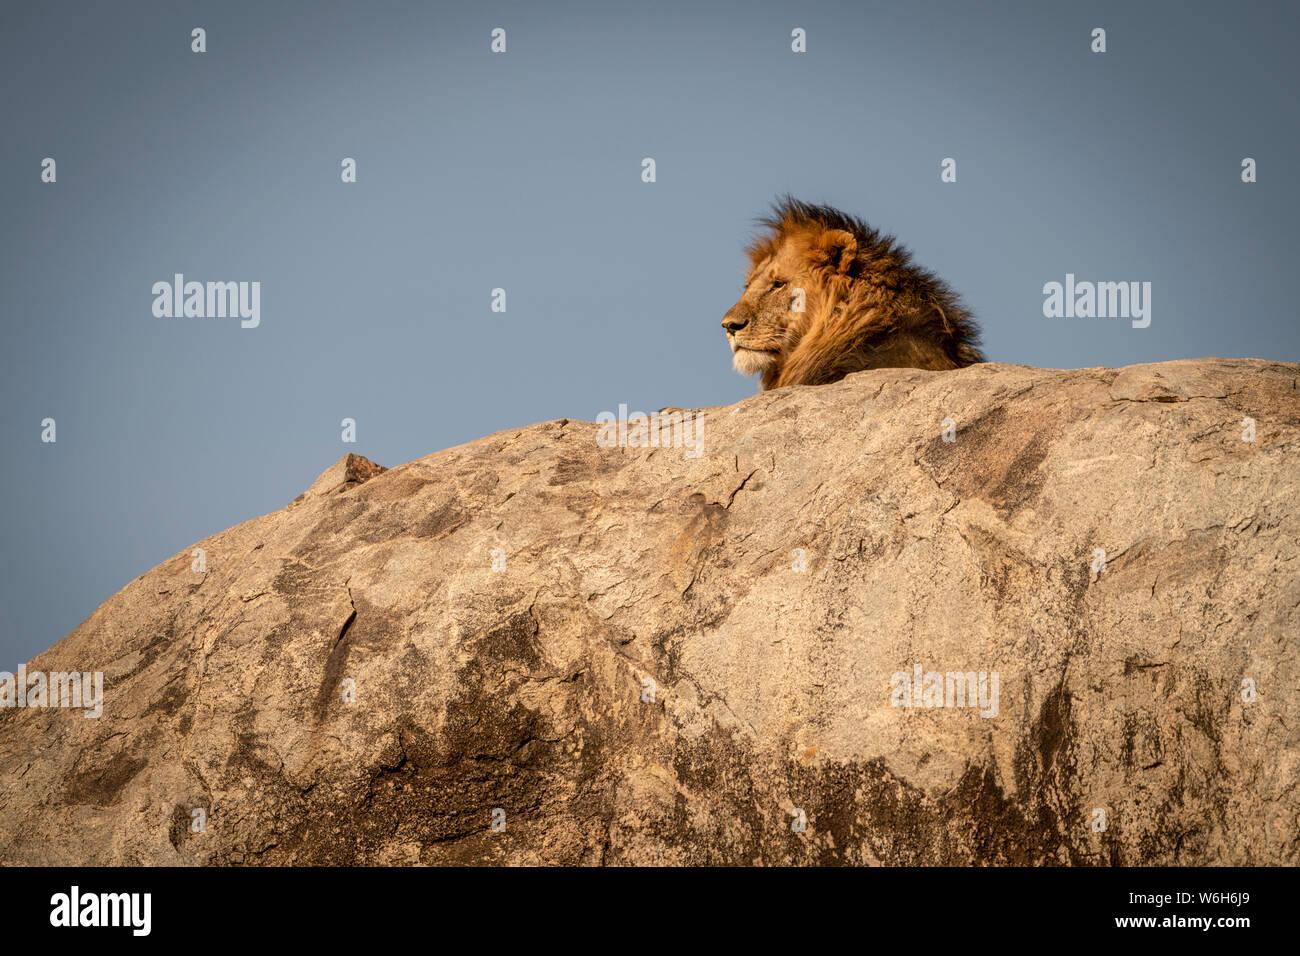 Cabeza de león macho (Panthera leo) tumbado sobre kopje, Parque Nacional del Serengeti, Tanzania Foto de stock